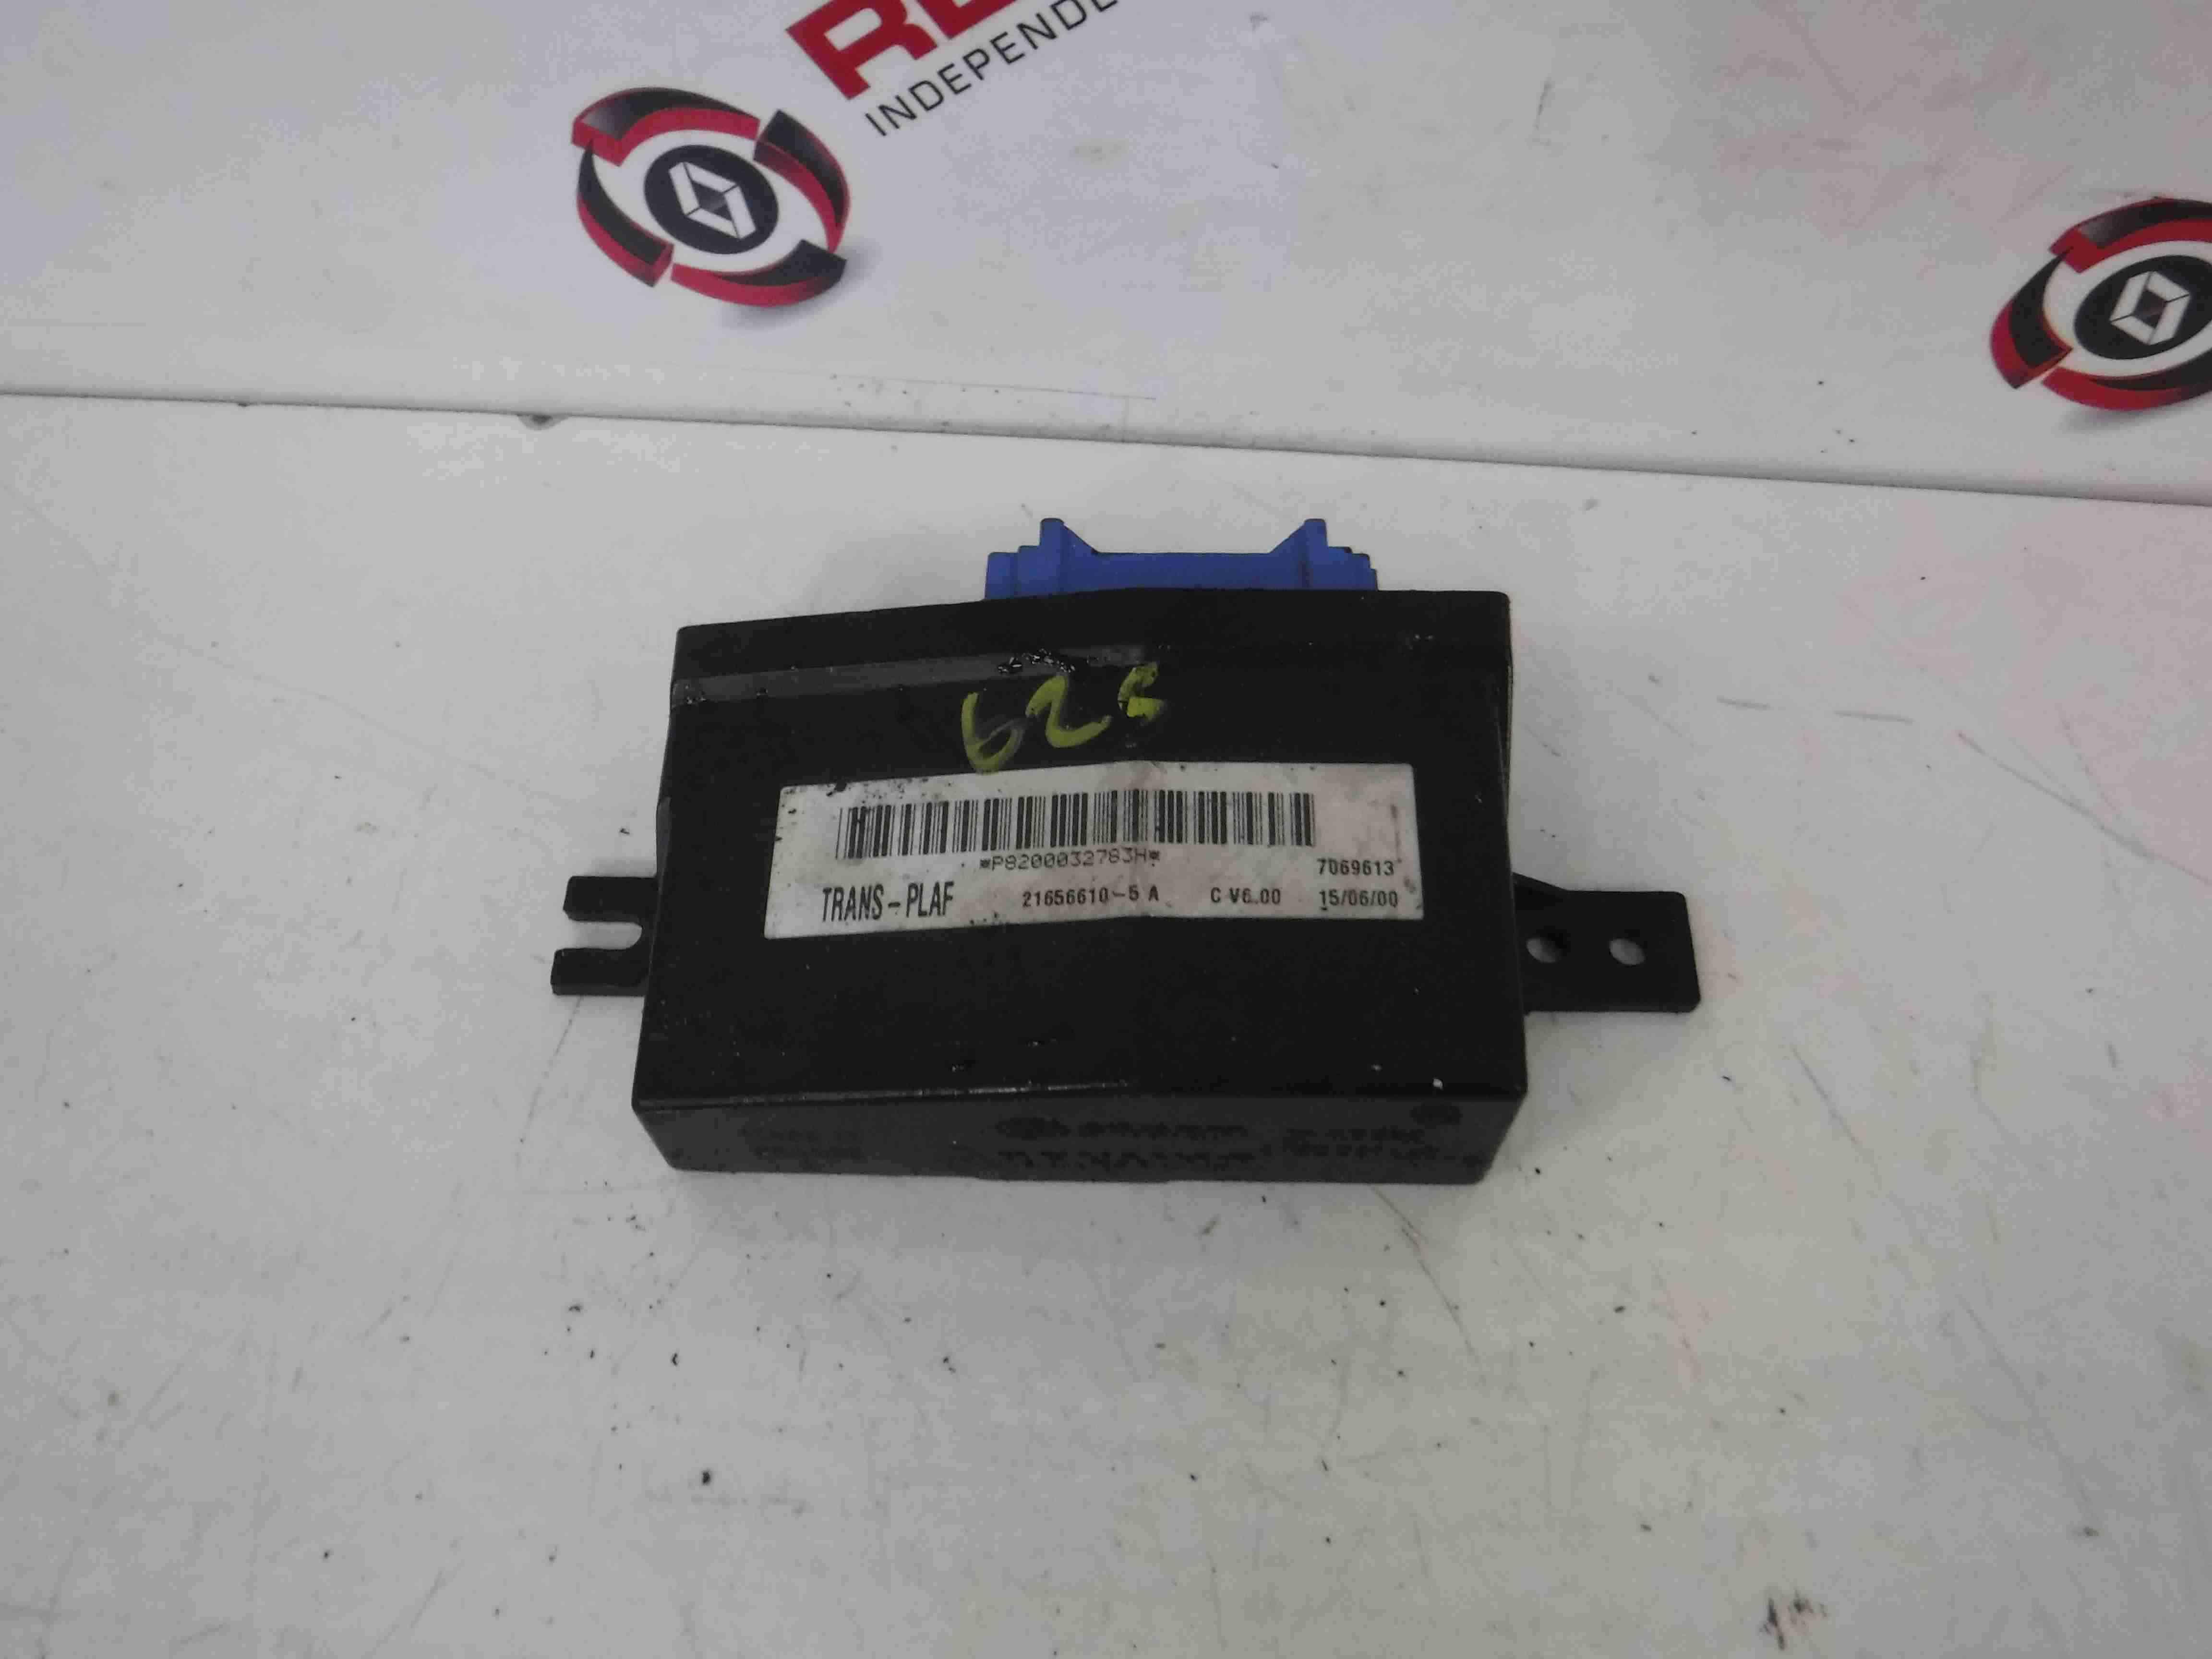 Renault Kangoo 1993-2003 1 9 D Fuse Box Uch Immobiliser Bcm 8200032783 - Store